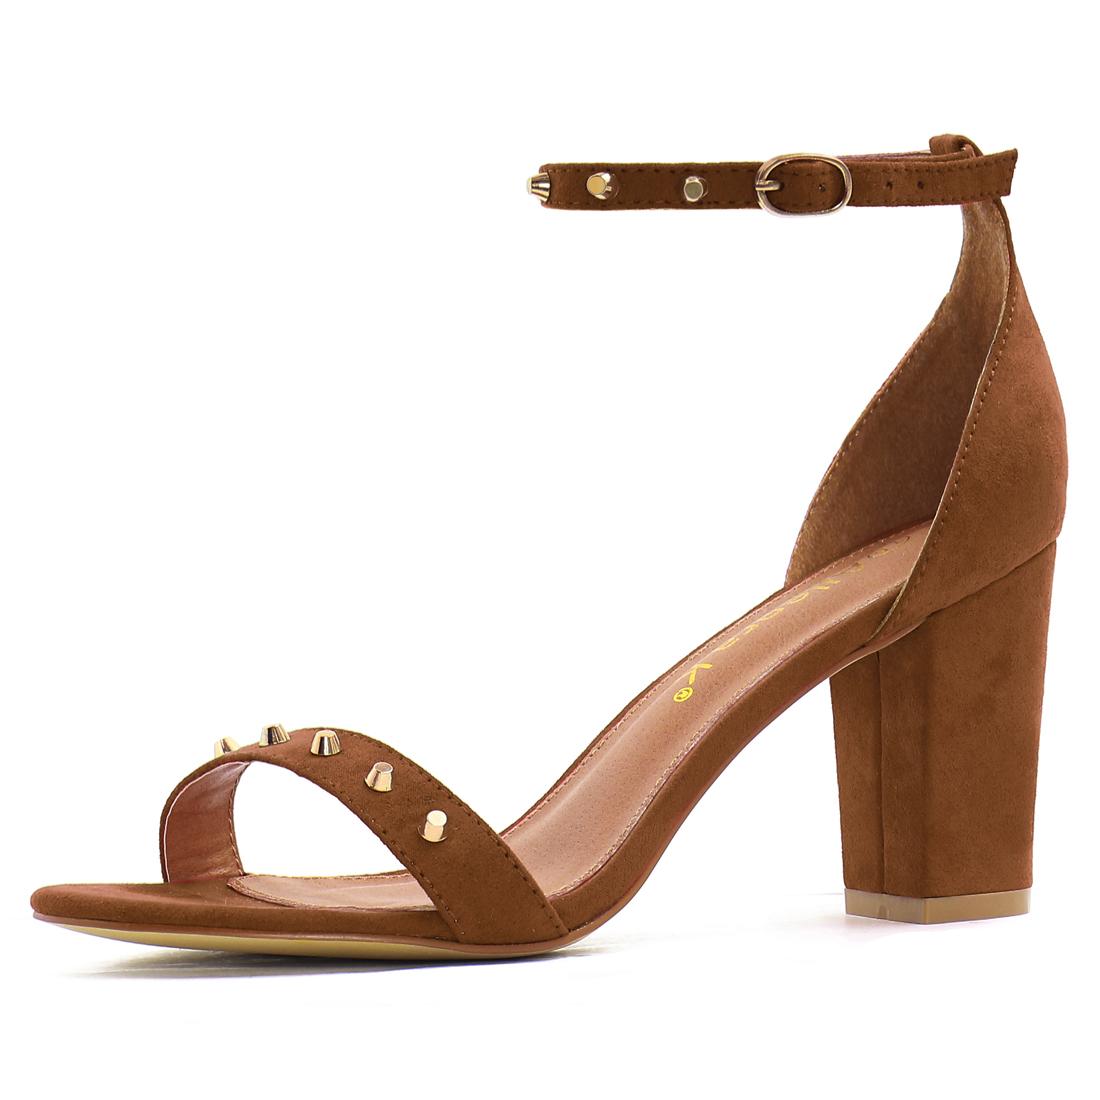 Women Open Toe Studs Embellished Ankle Strap Block Heels Brown US 5.5